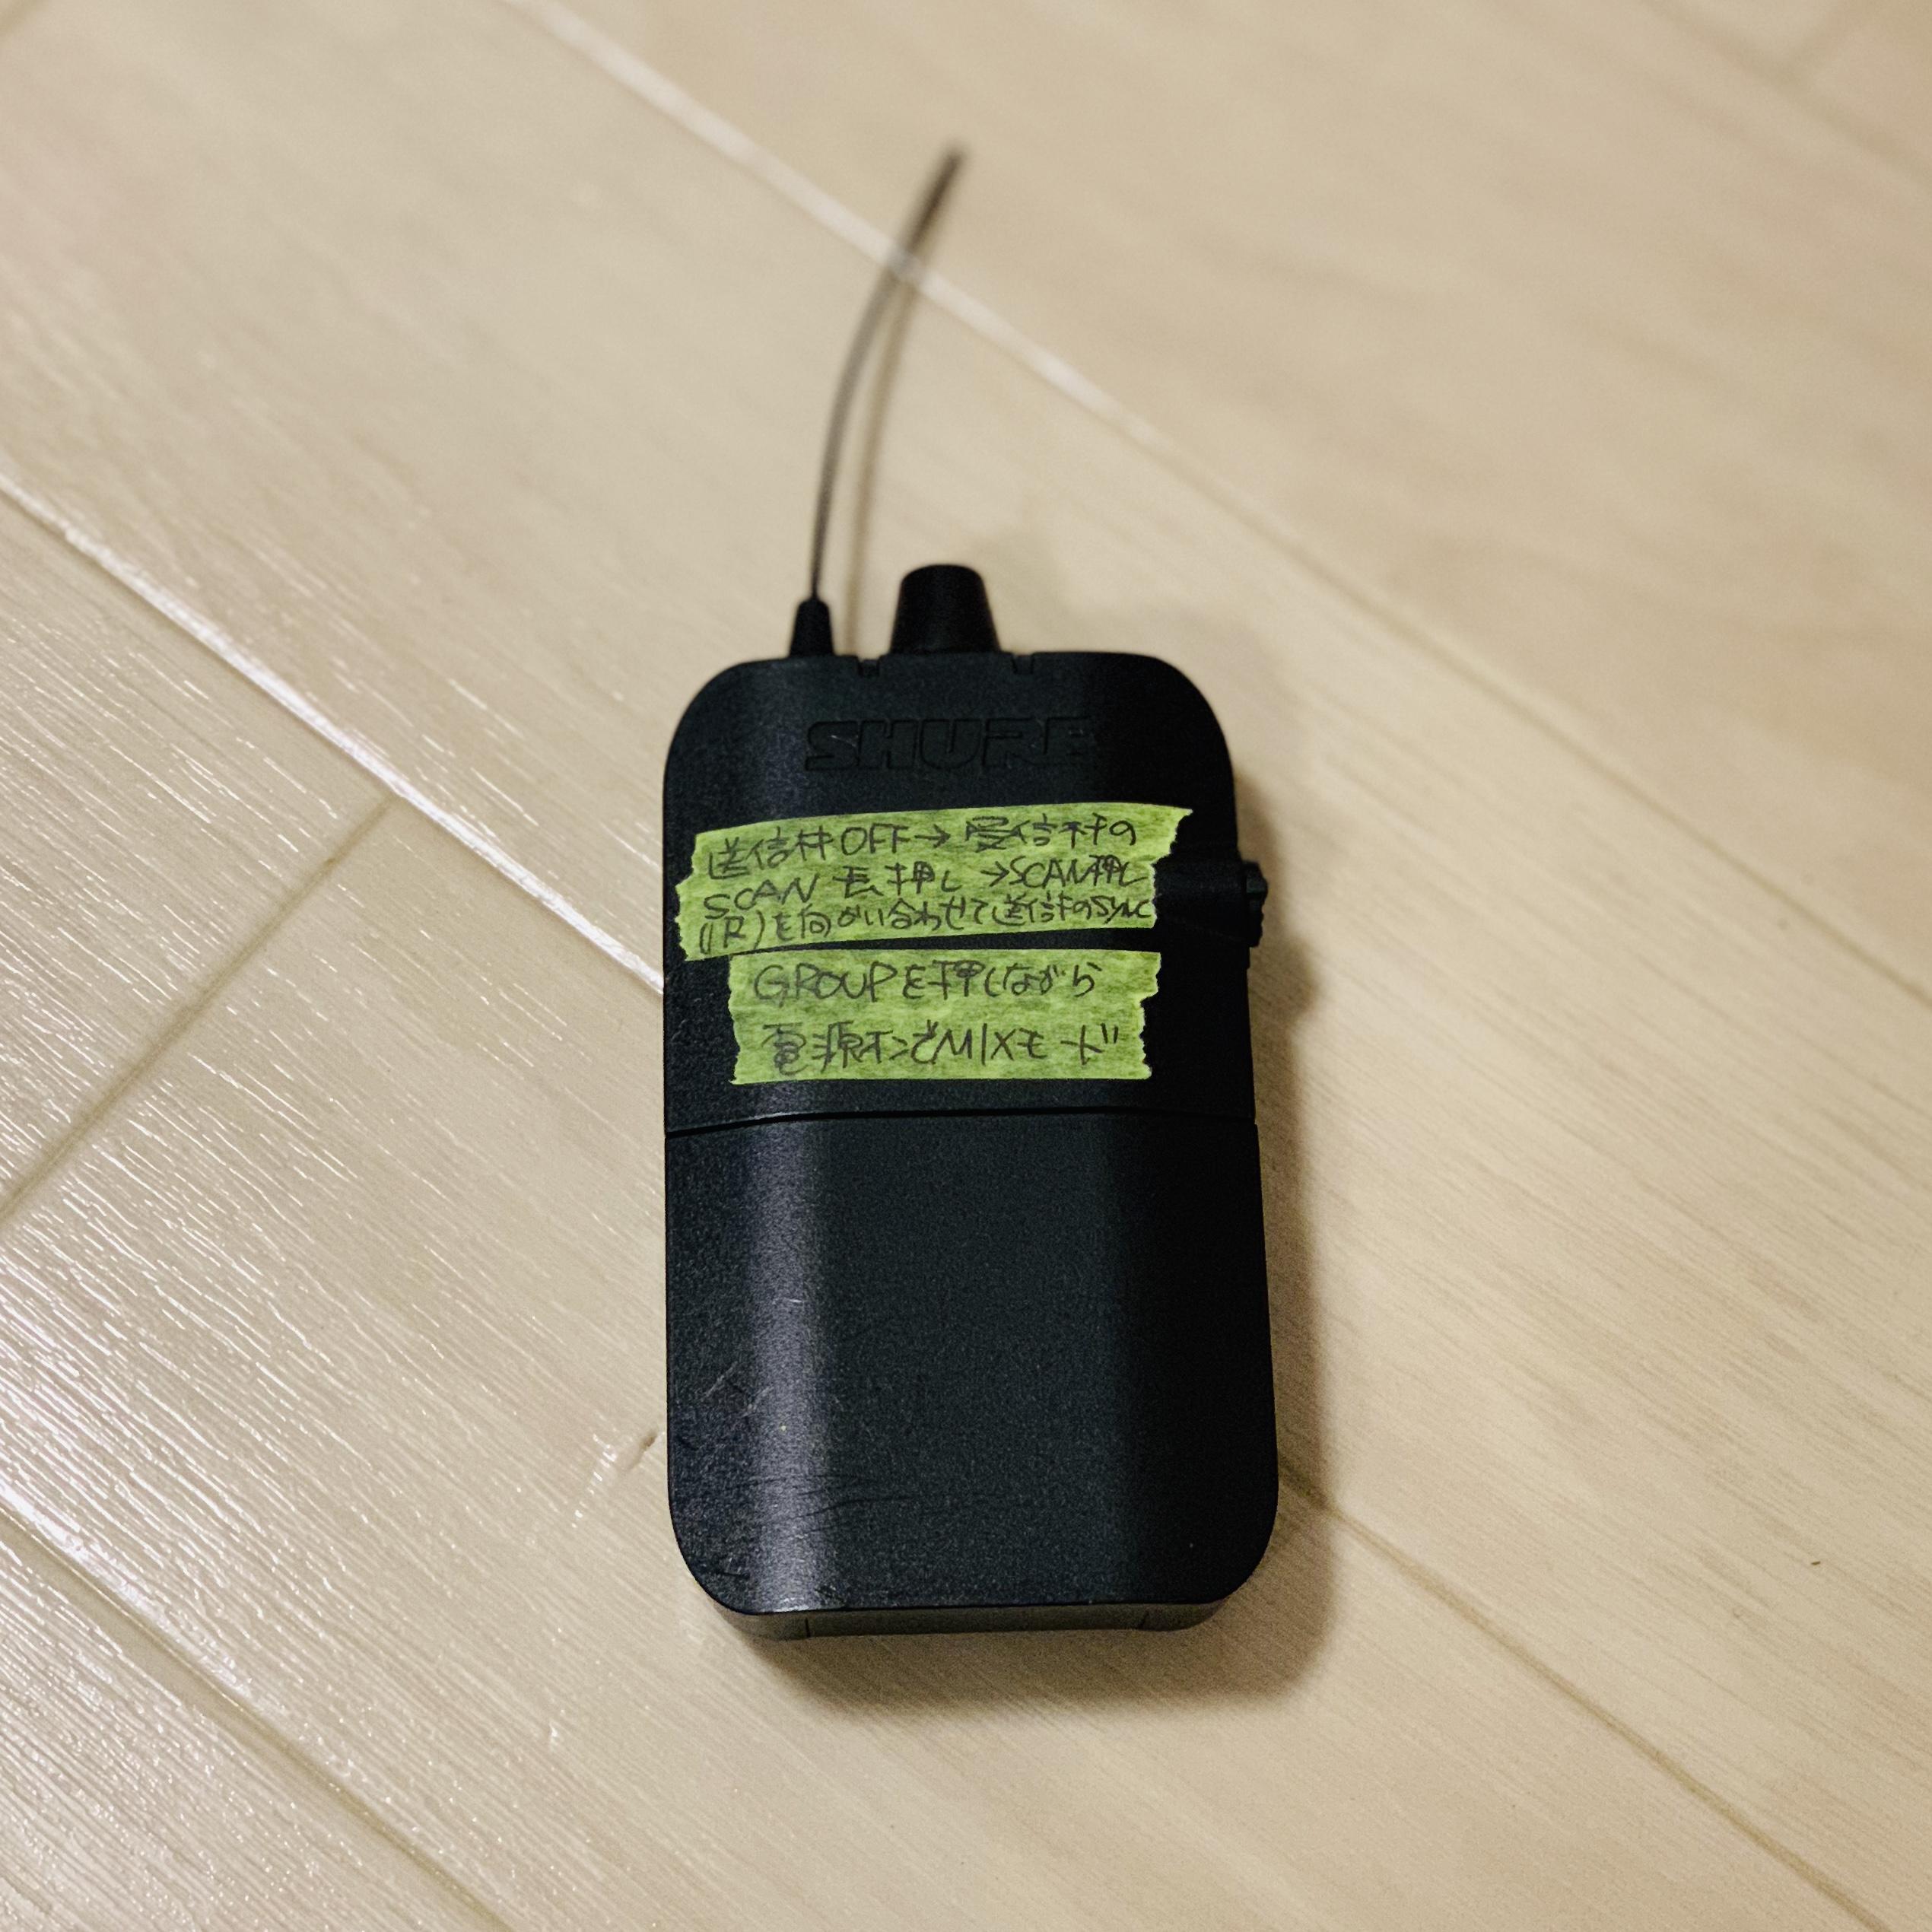 SHURE PSM300 ワイヤレスイヤーモニター・おススメの使い方と注意点